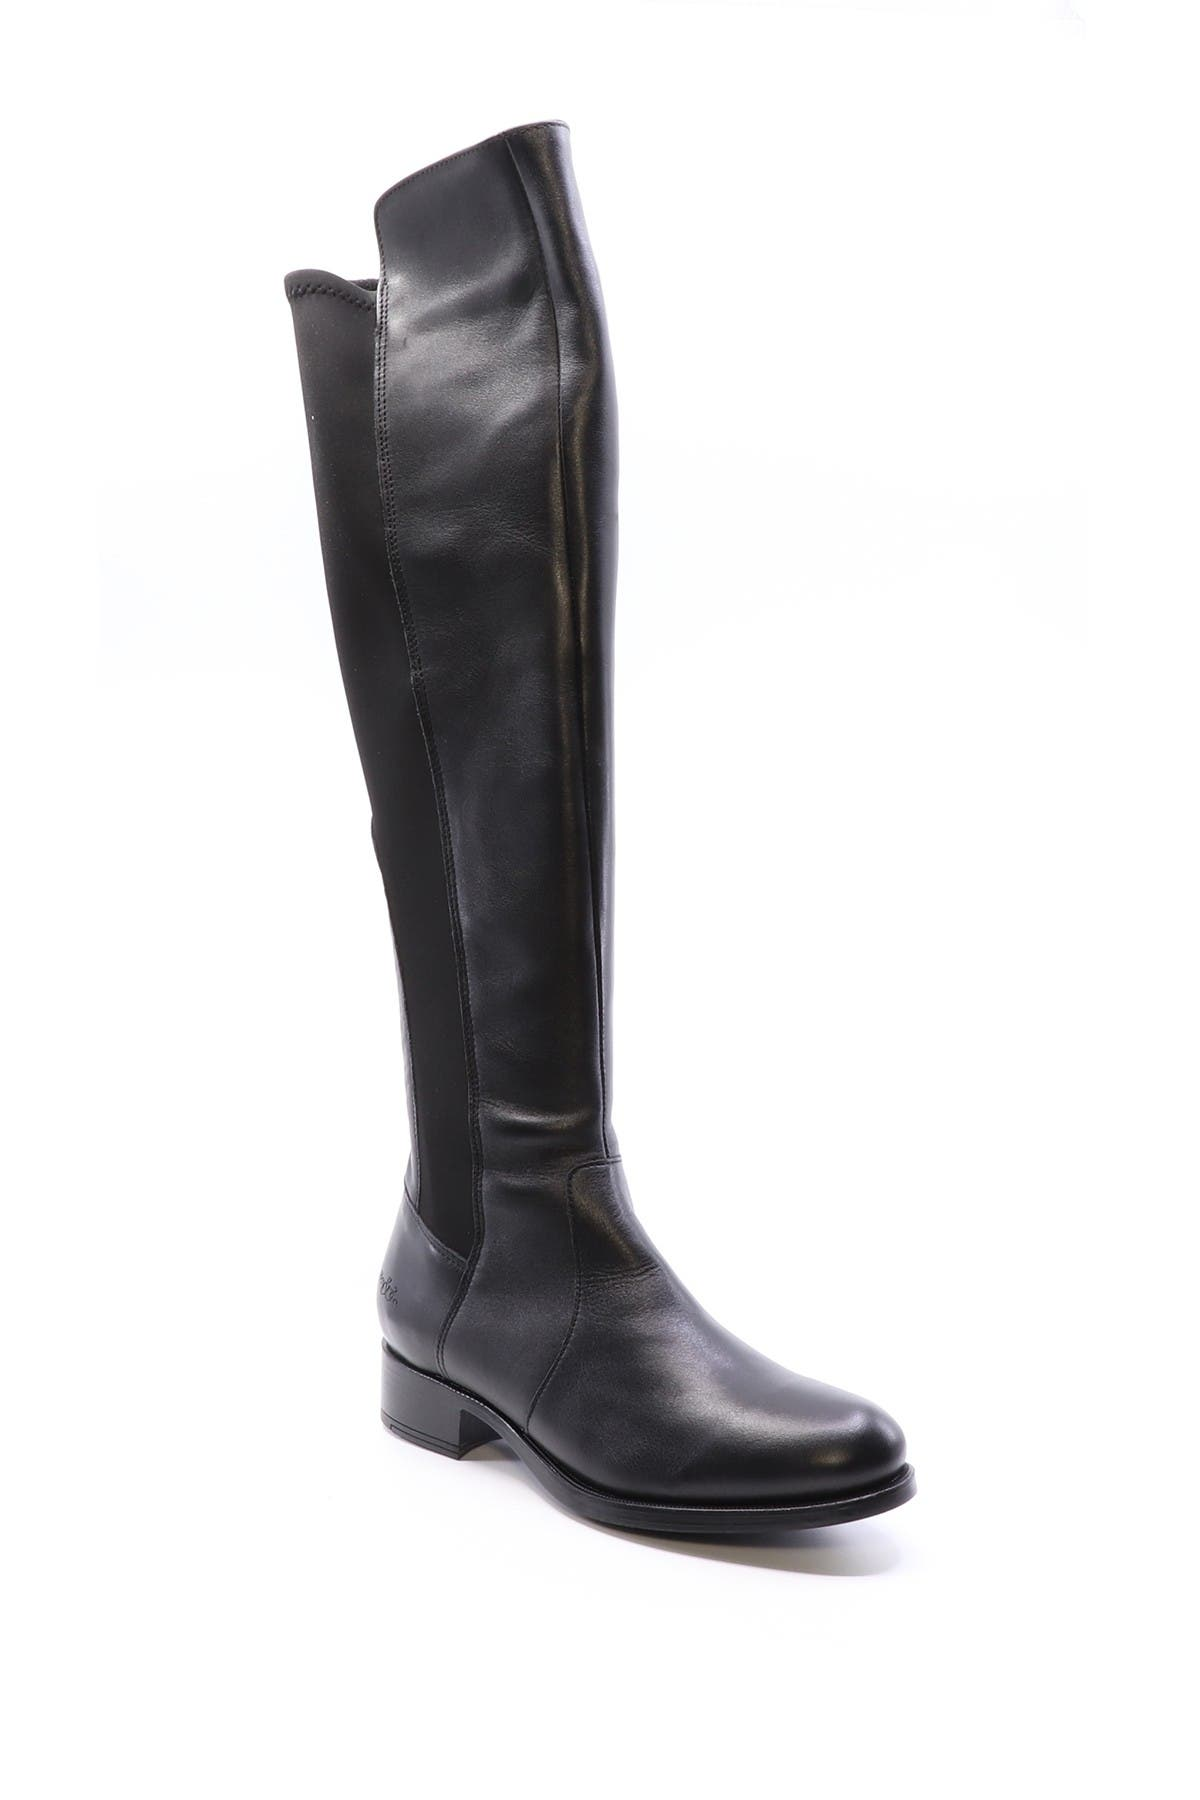 Image of Bos. & Co. Bunt Waterproof Over the Knee Boot